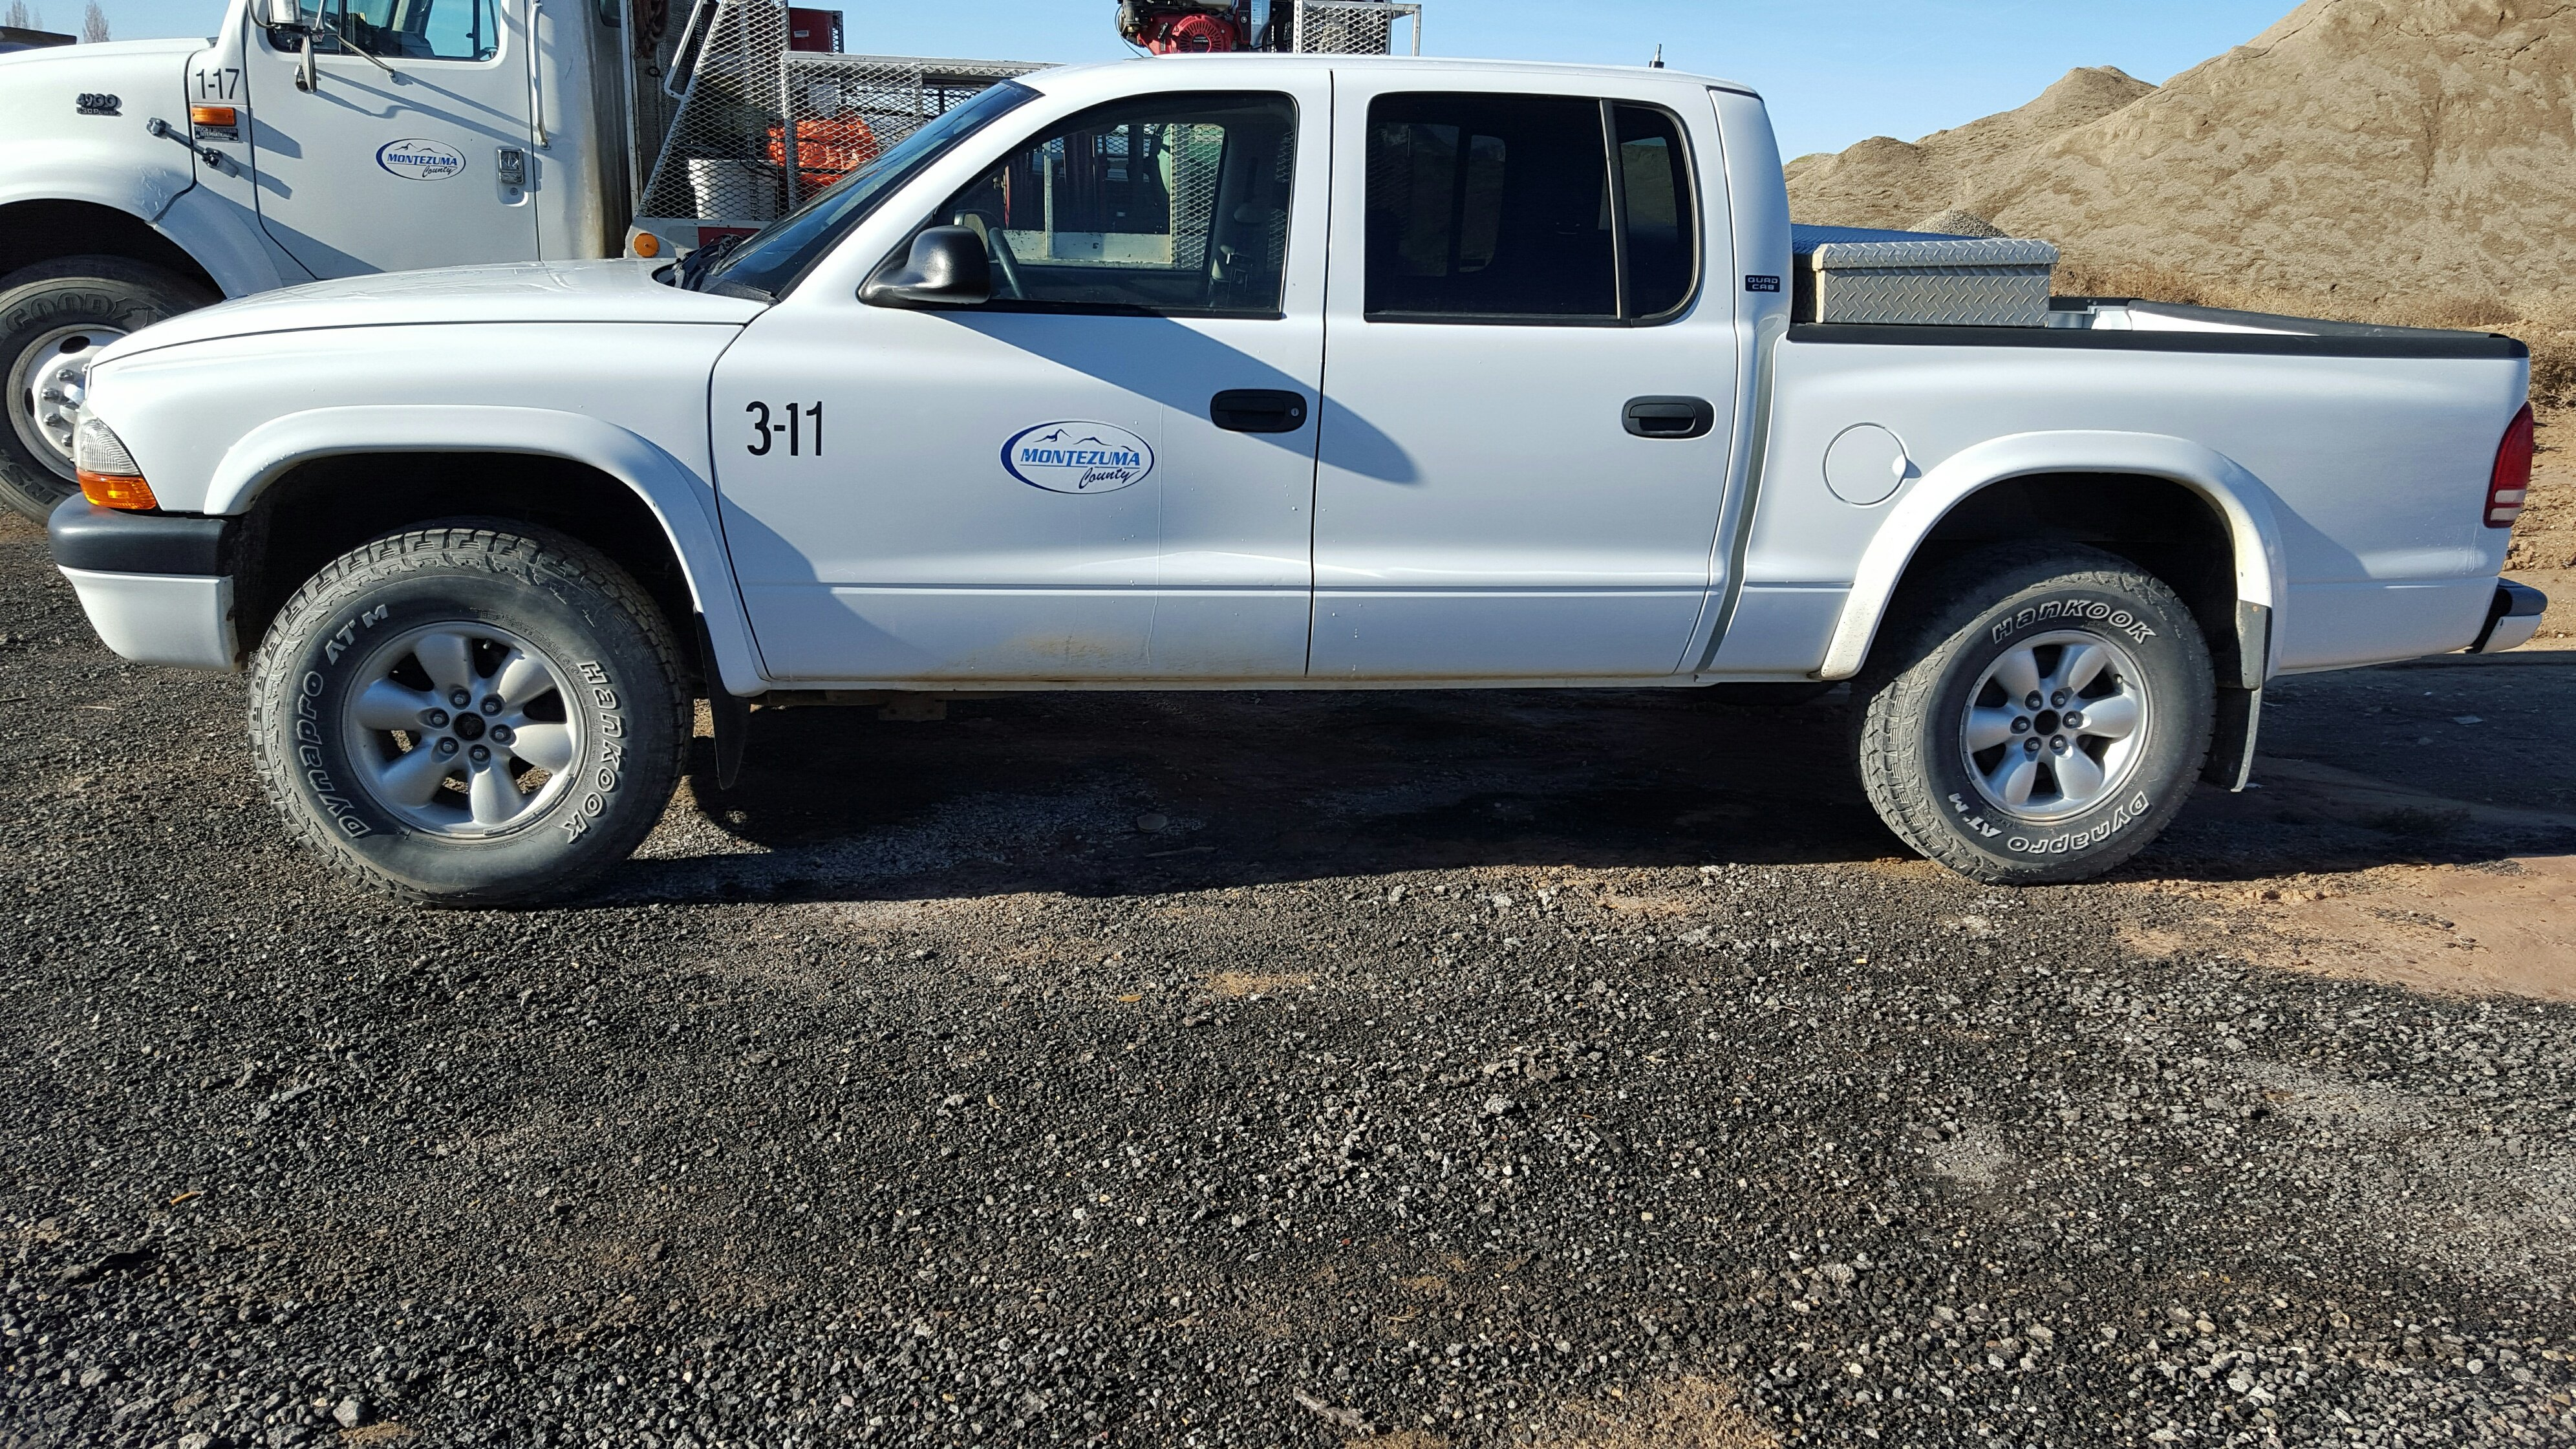 Colo. County Creates Fleet Management Department